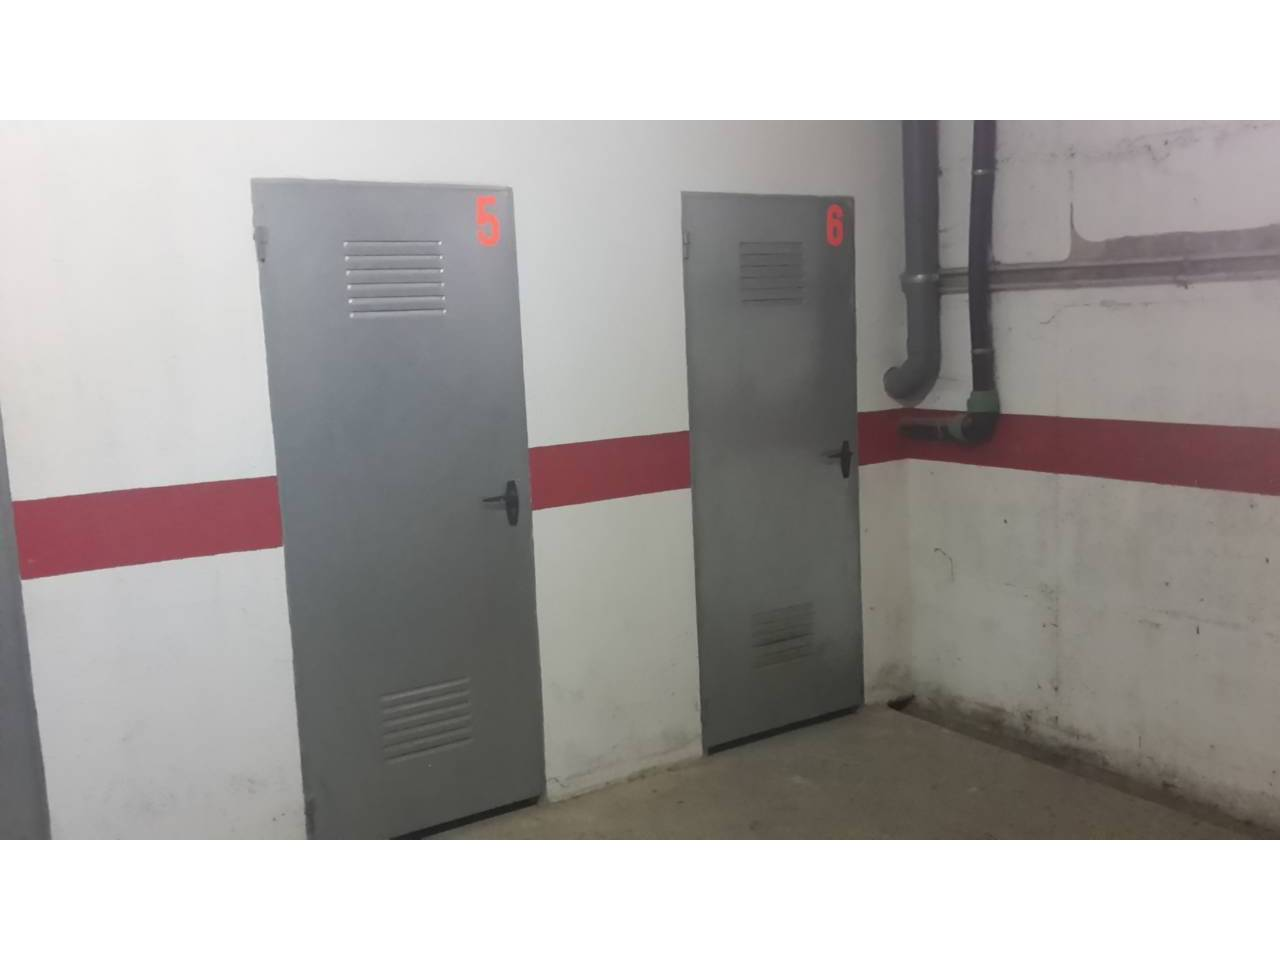 066034 - OLIVERA Storage room